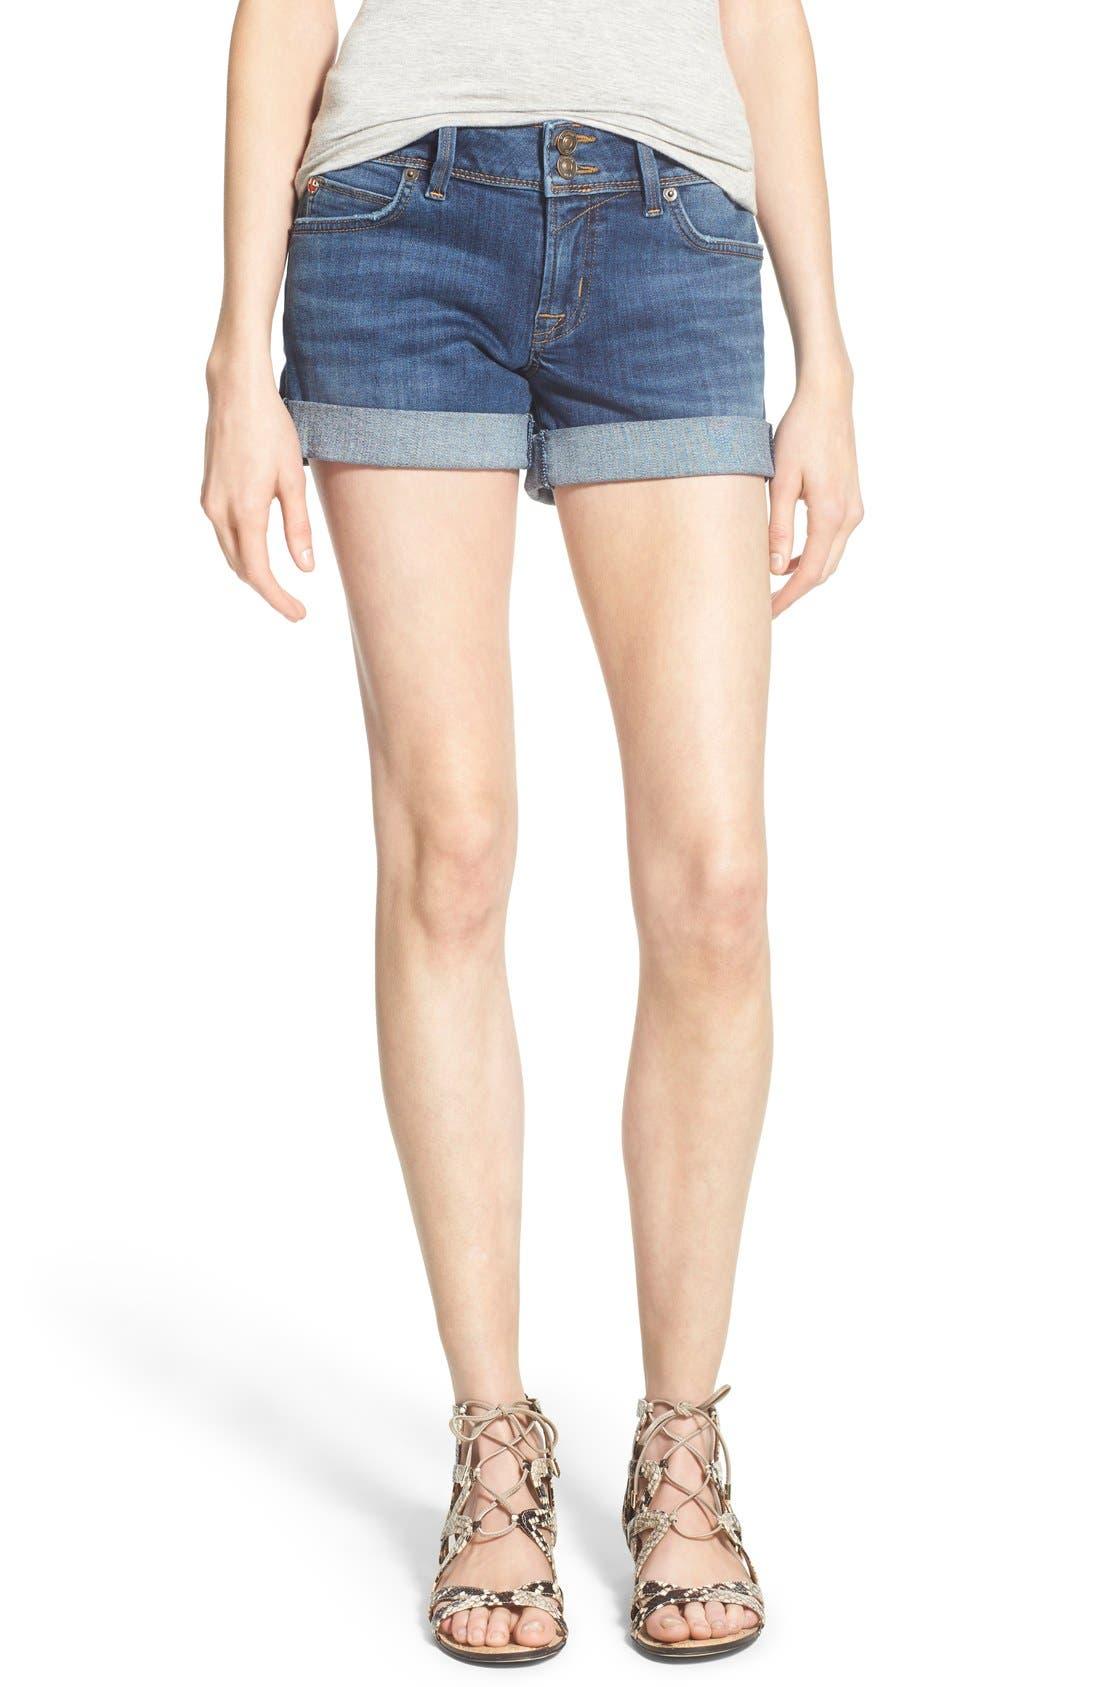 Alternate Image 1 Selected - Hudson Jeans 'Croxley' Cuffed Denim Shorts (Advantageous)